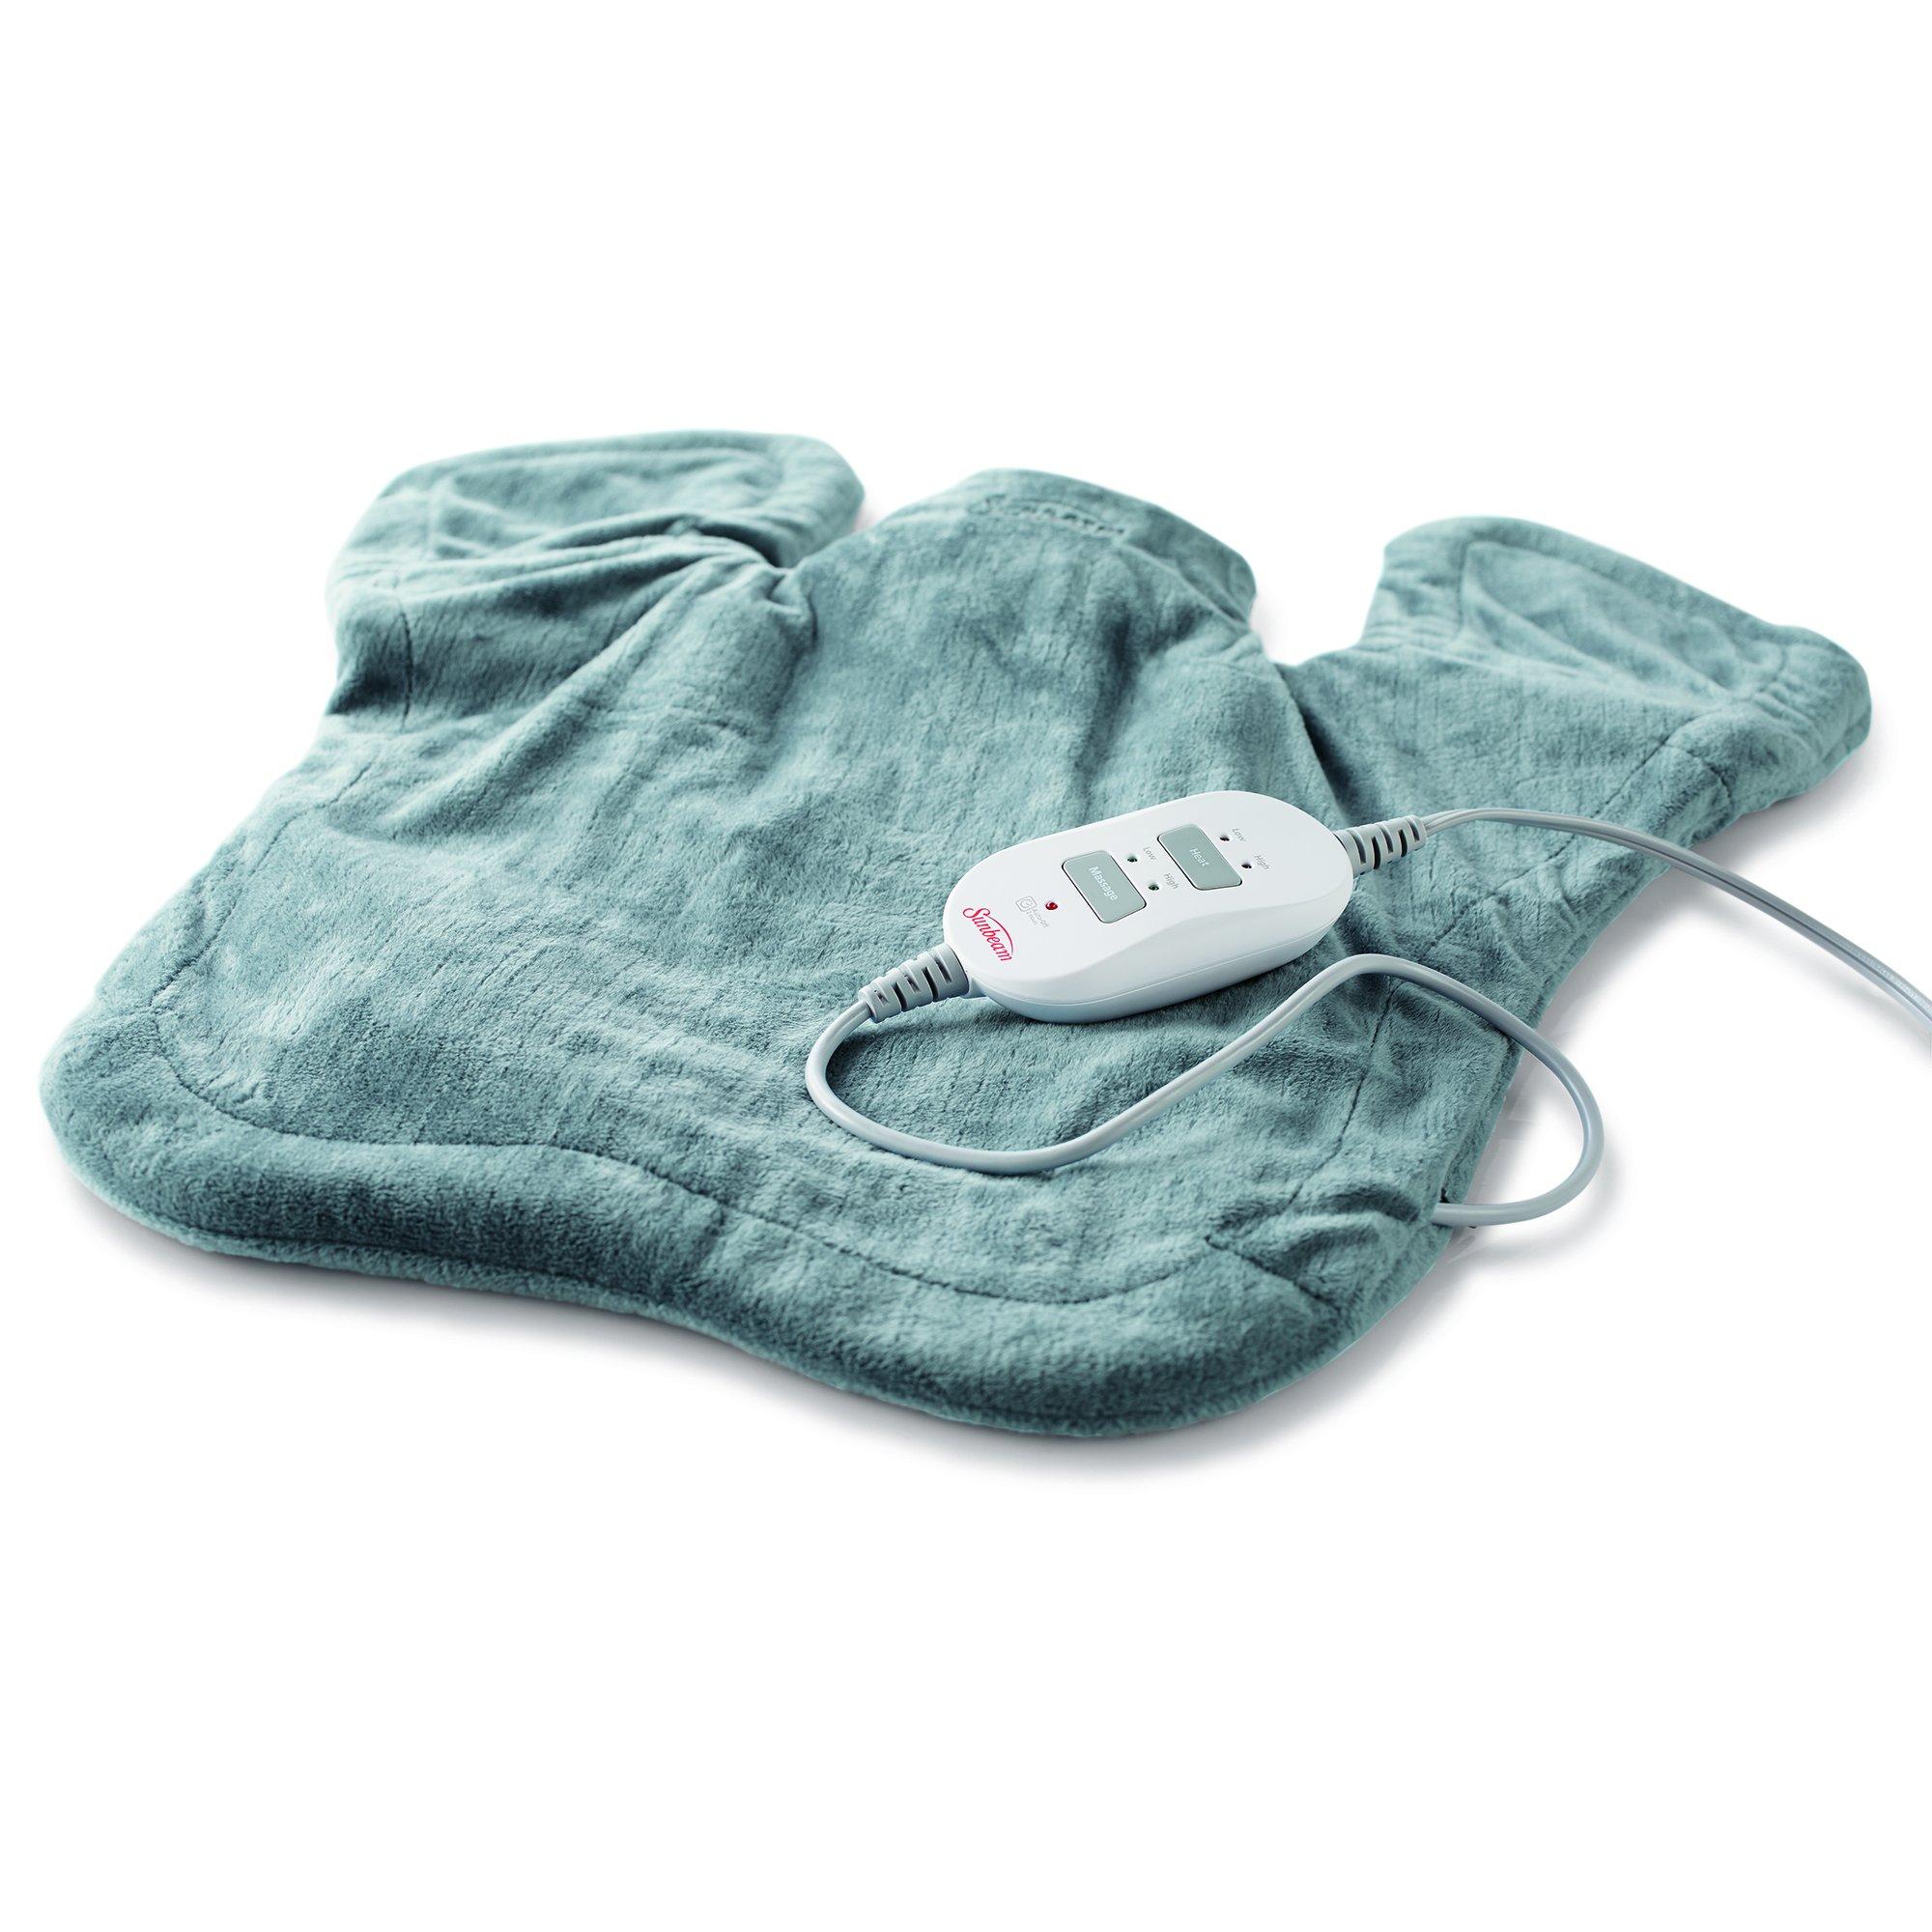 Sunbeam Renue Massaging XL Tension Relief Heat Therapy Wrap, Moist/Dry Heat, Digital Controller, 4 Heat-Settings, 2-Hour Auto-Off, Machine Washable, 25'' x 25'', Grey